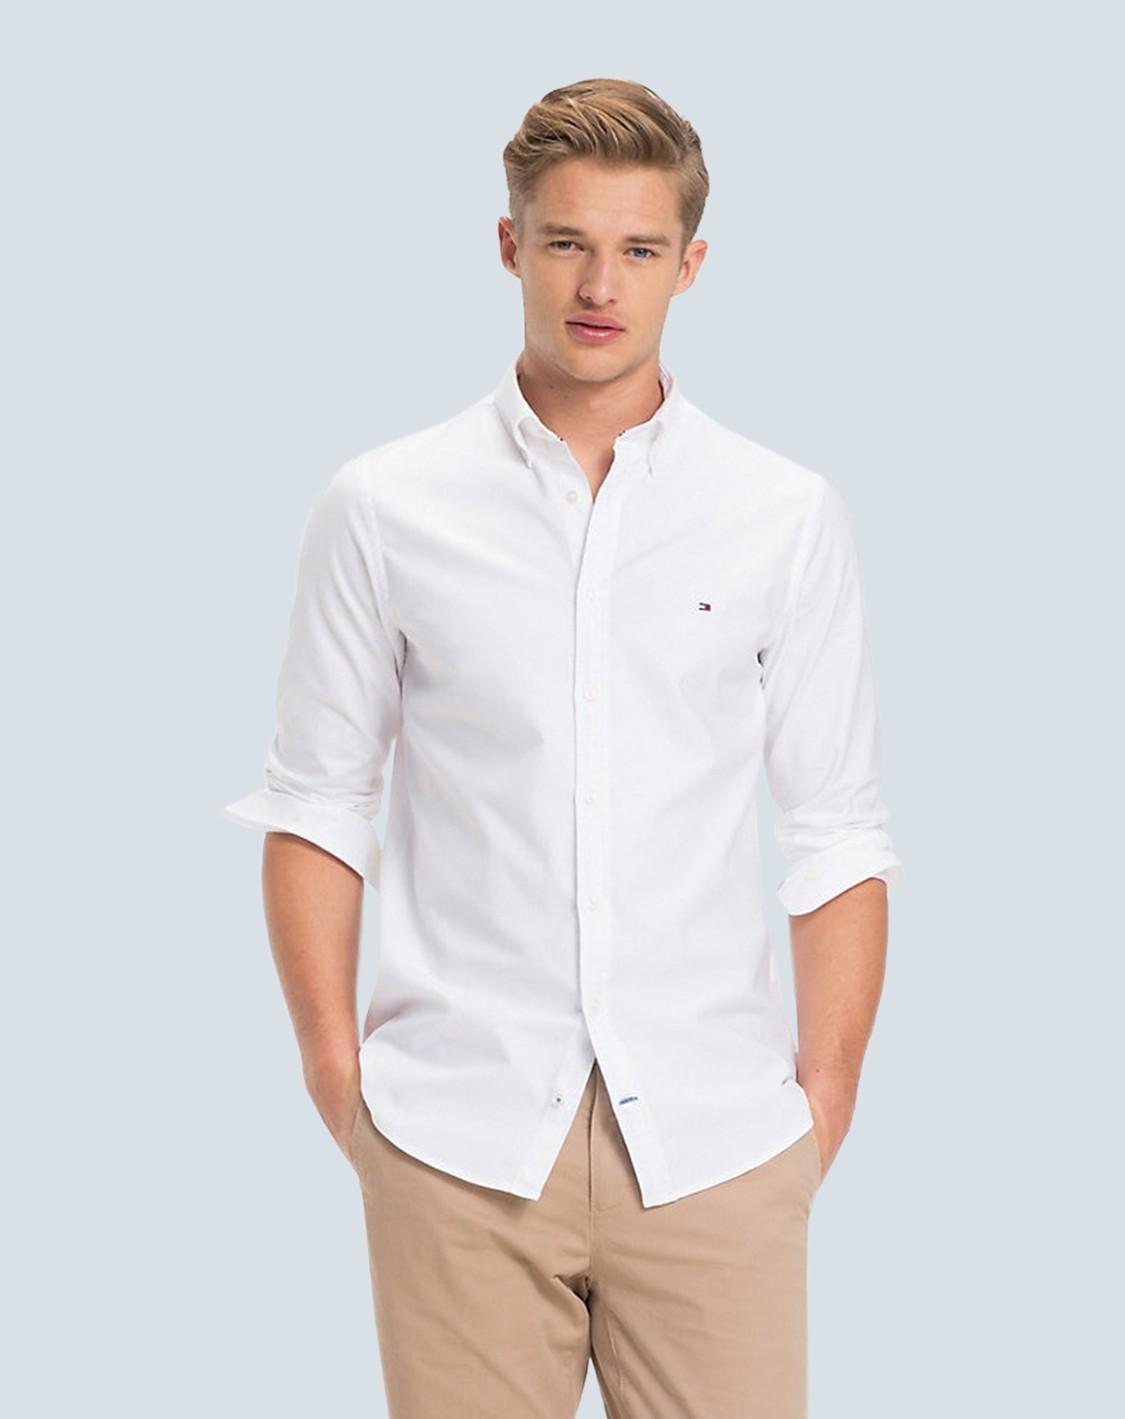 Camisa Social TH Branca Oxford